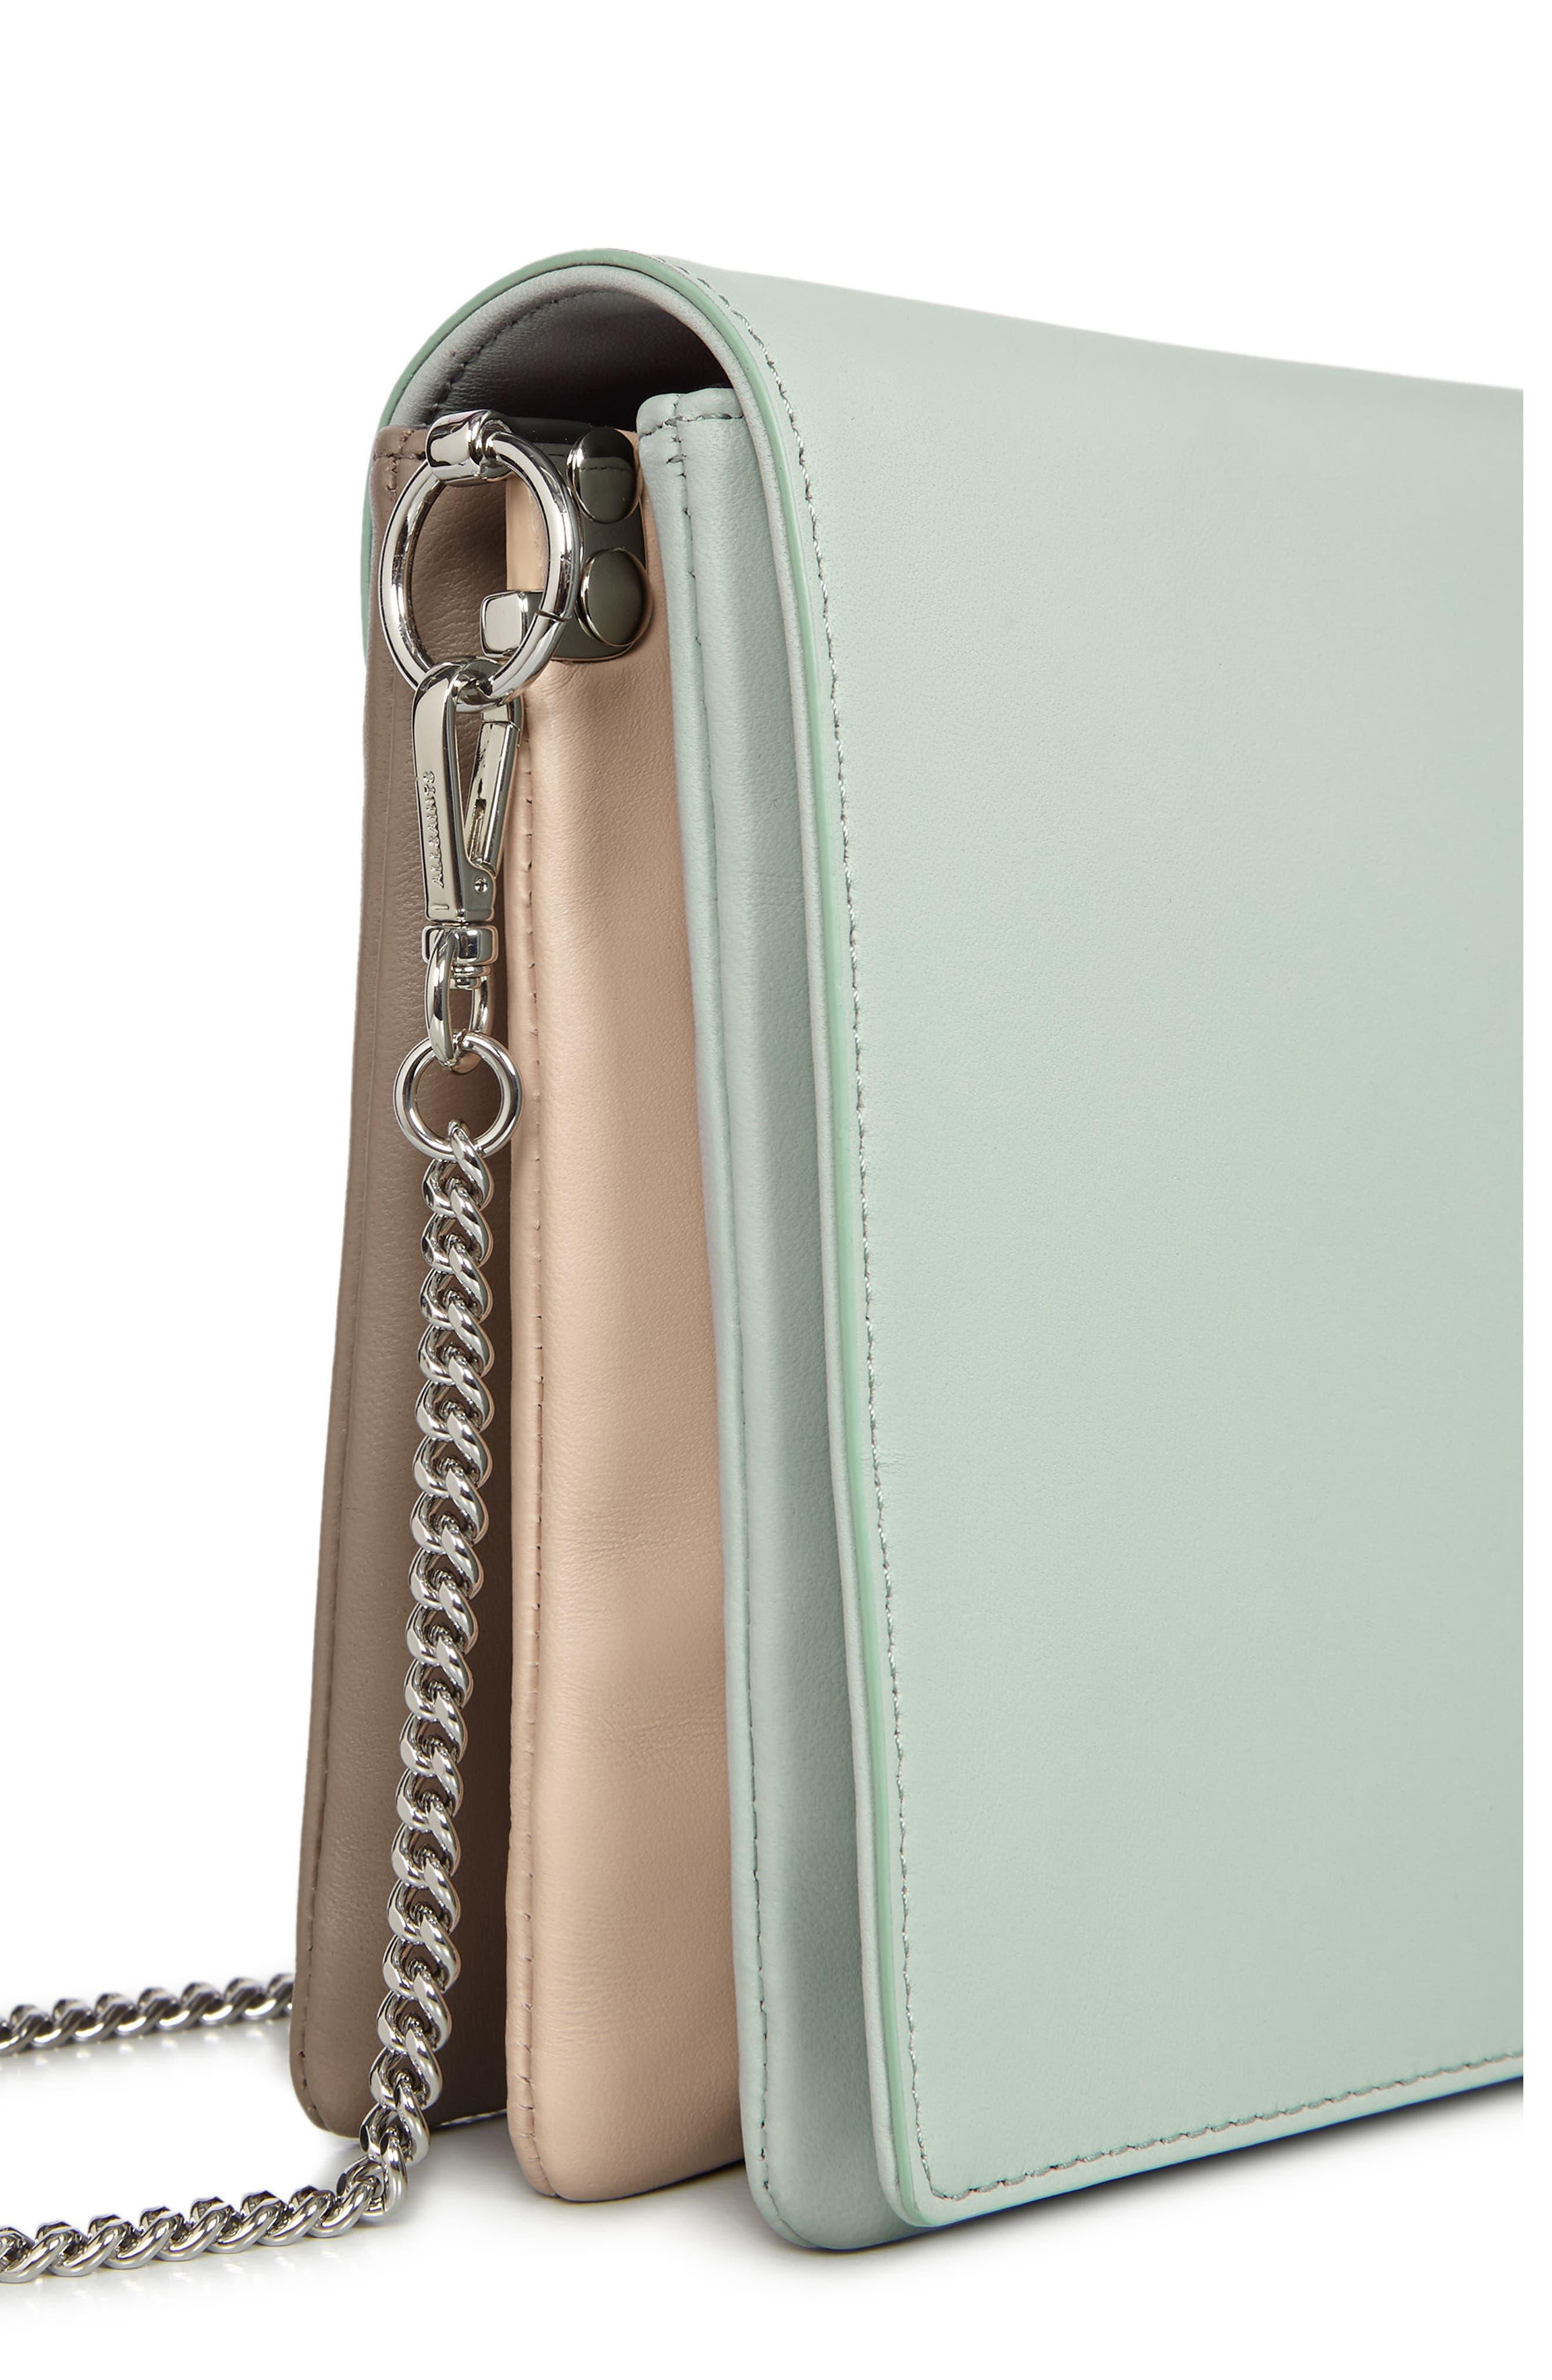 Zep Colorblock Leather Shoulder Bag,                             Alternate thumbnail 7, color,                             MINT GREEN